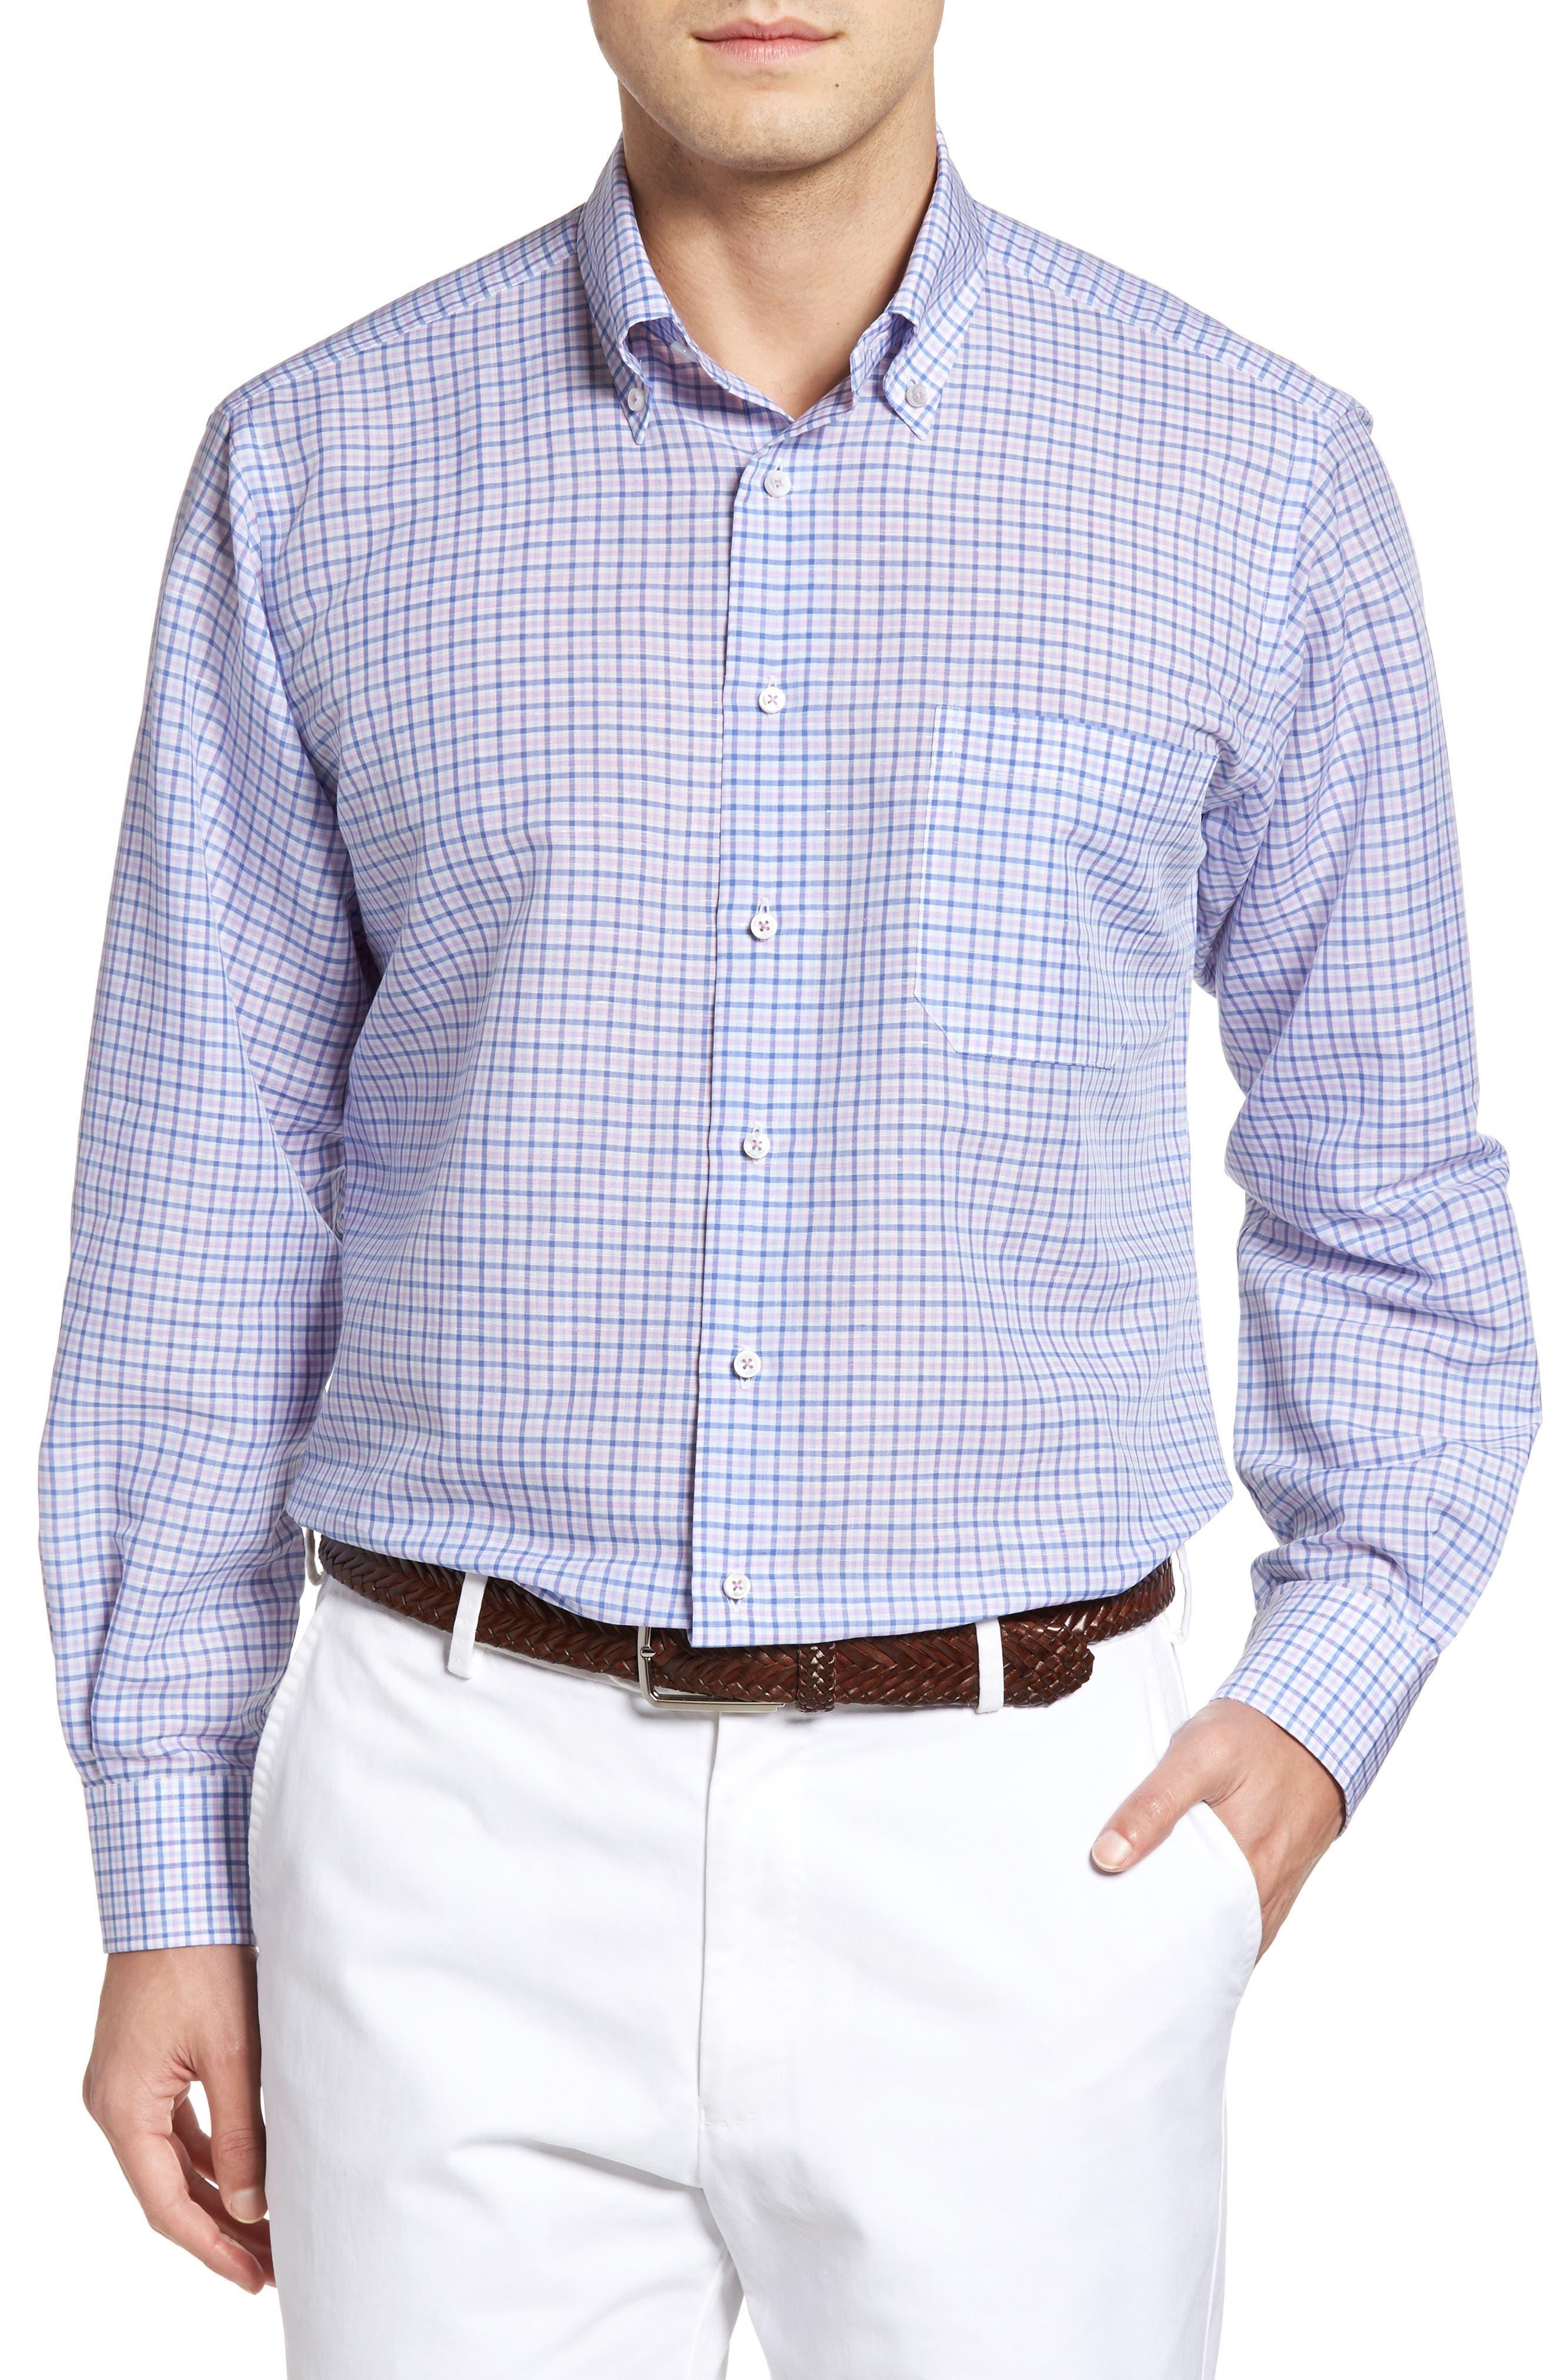 Alternate Image 1 Selected - Robert Talbott Estate Classic Fit Sport Shirt